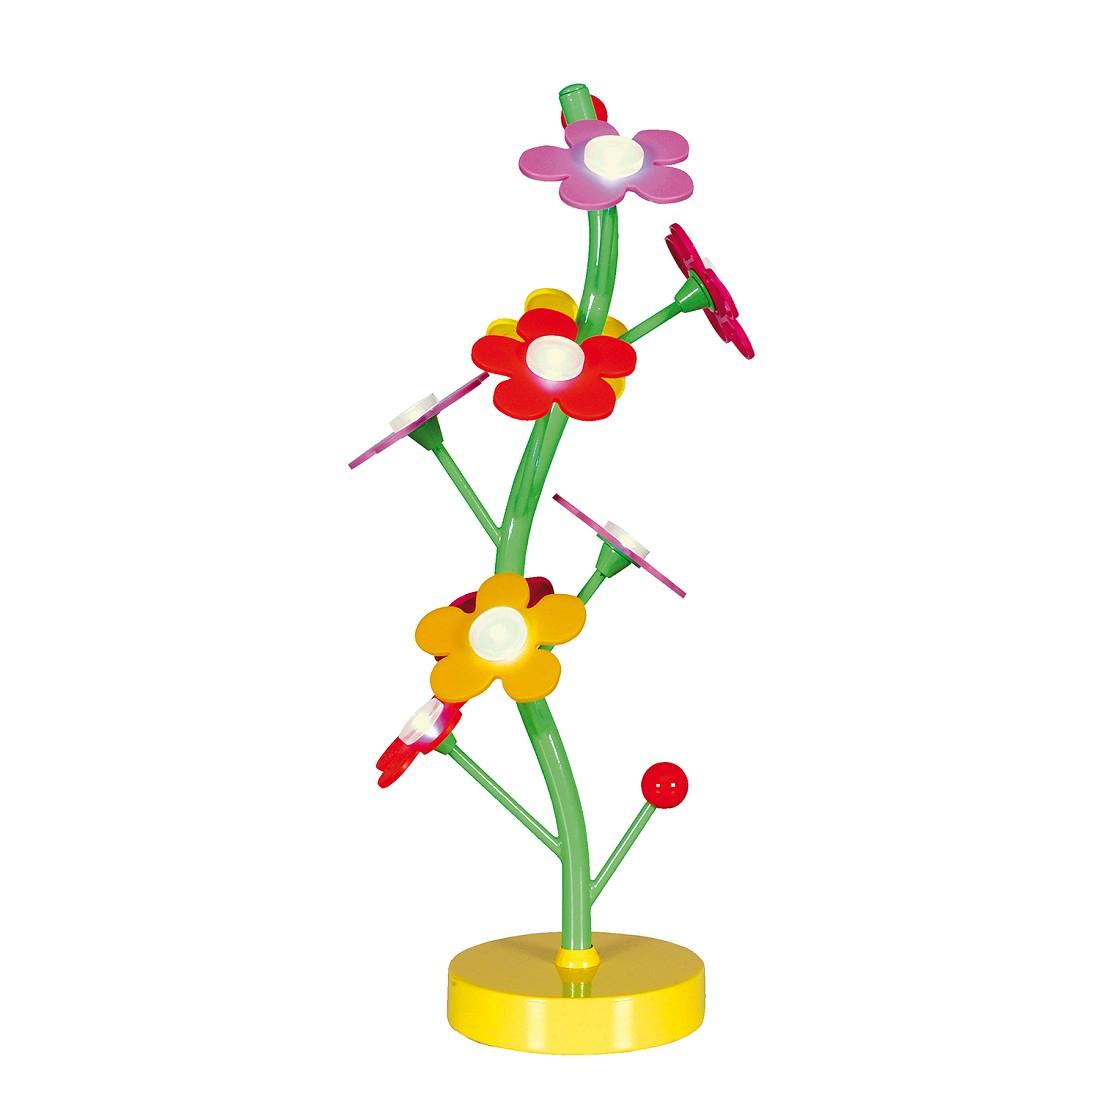 Tischleuchte Flower ● Metall/ Kunststoff ● Multicolor ● -flammig ● -flammig- Näve